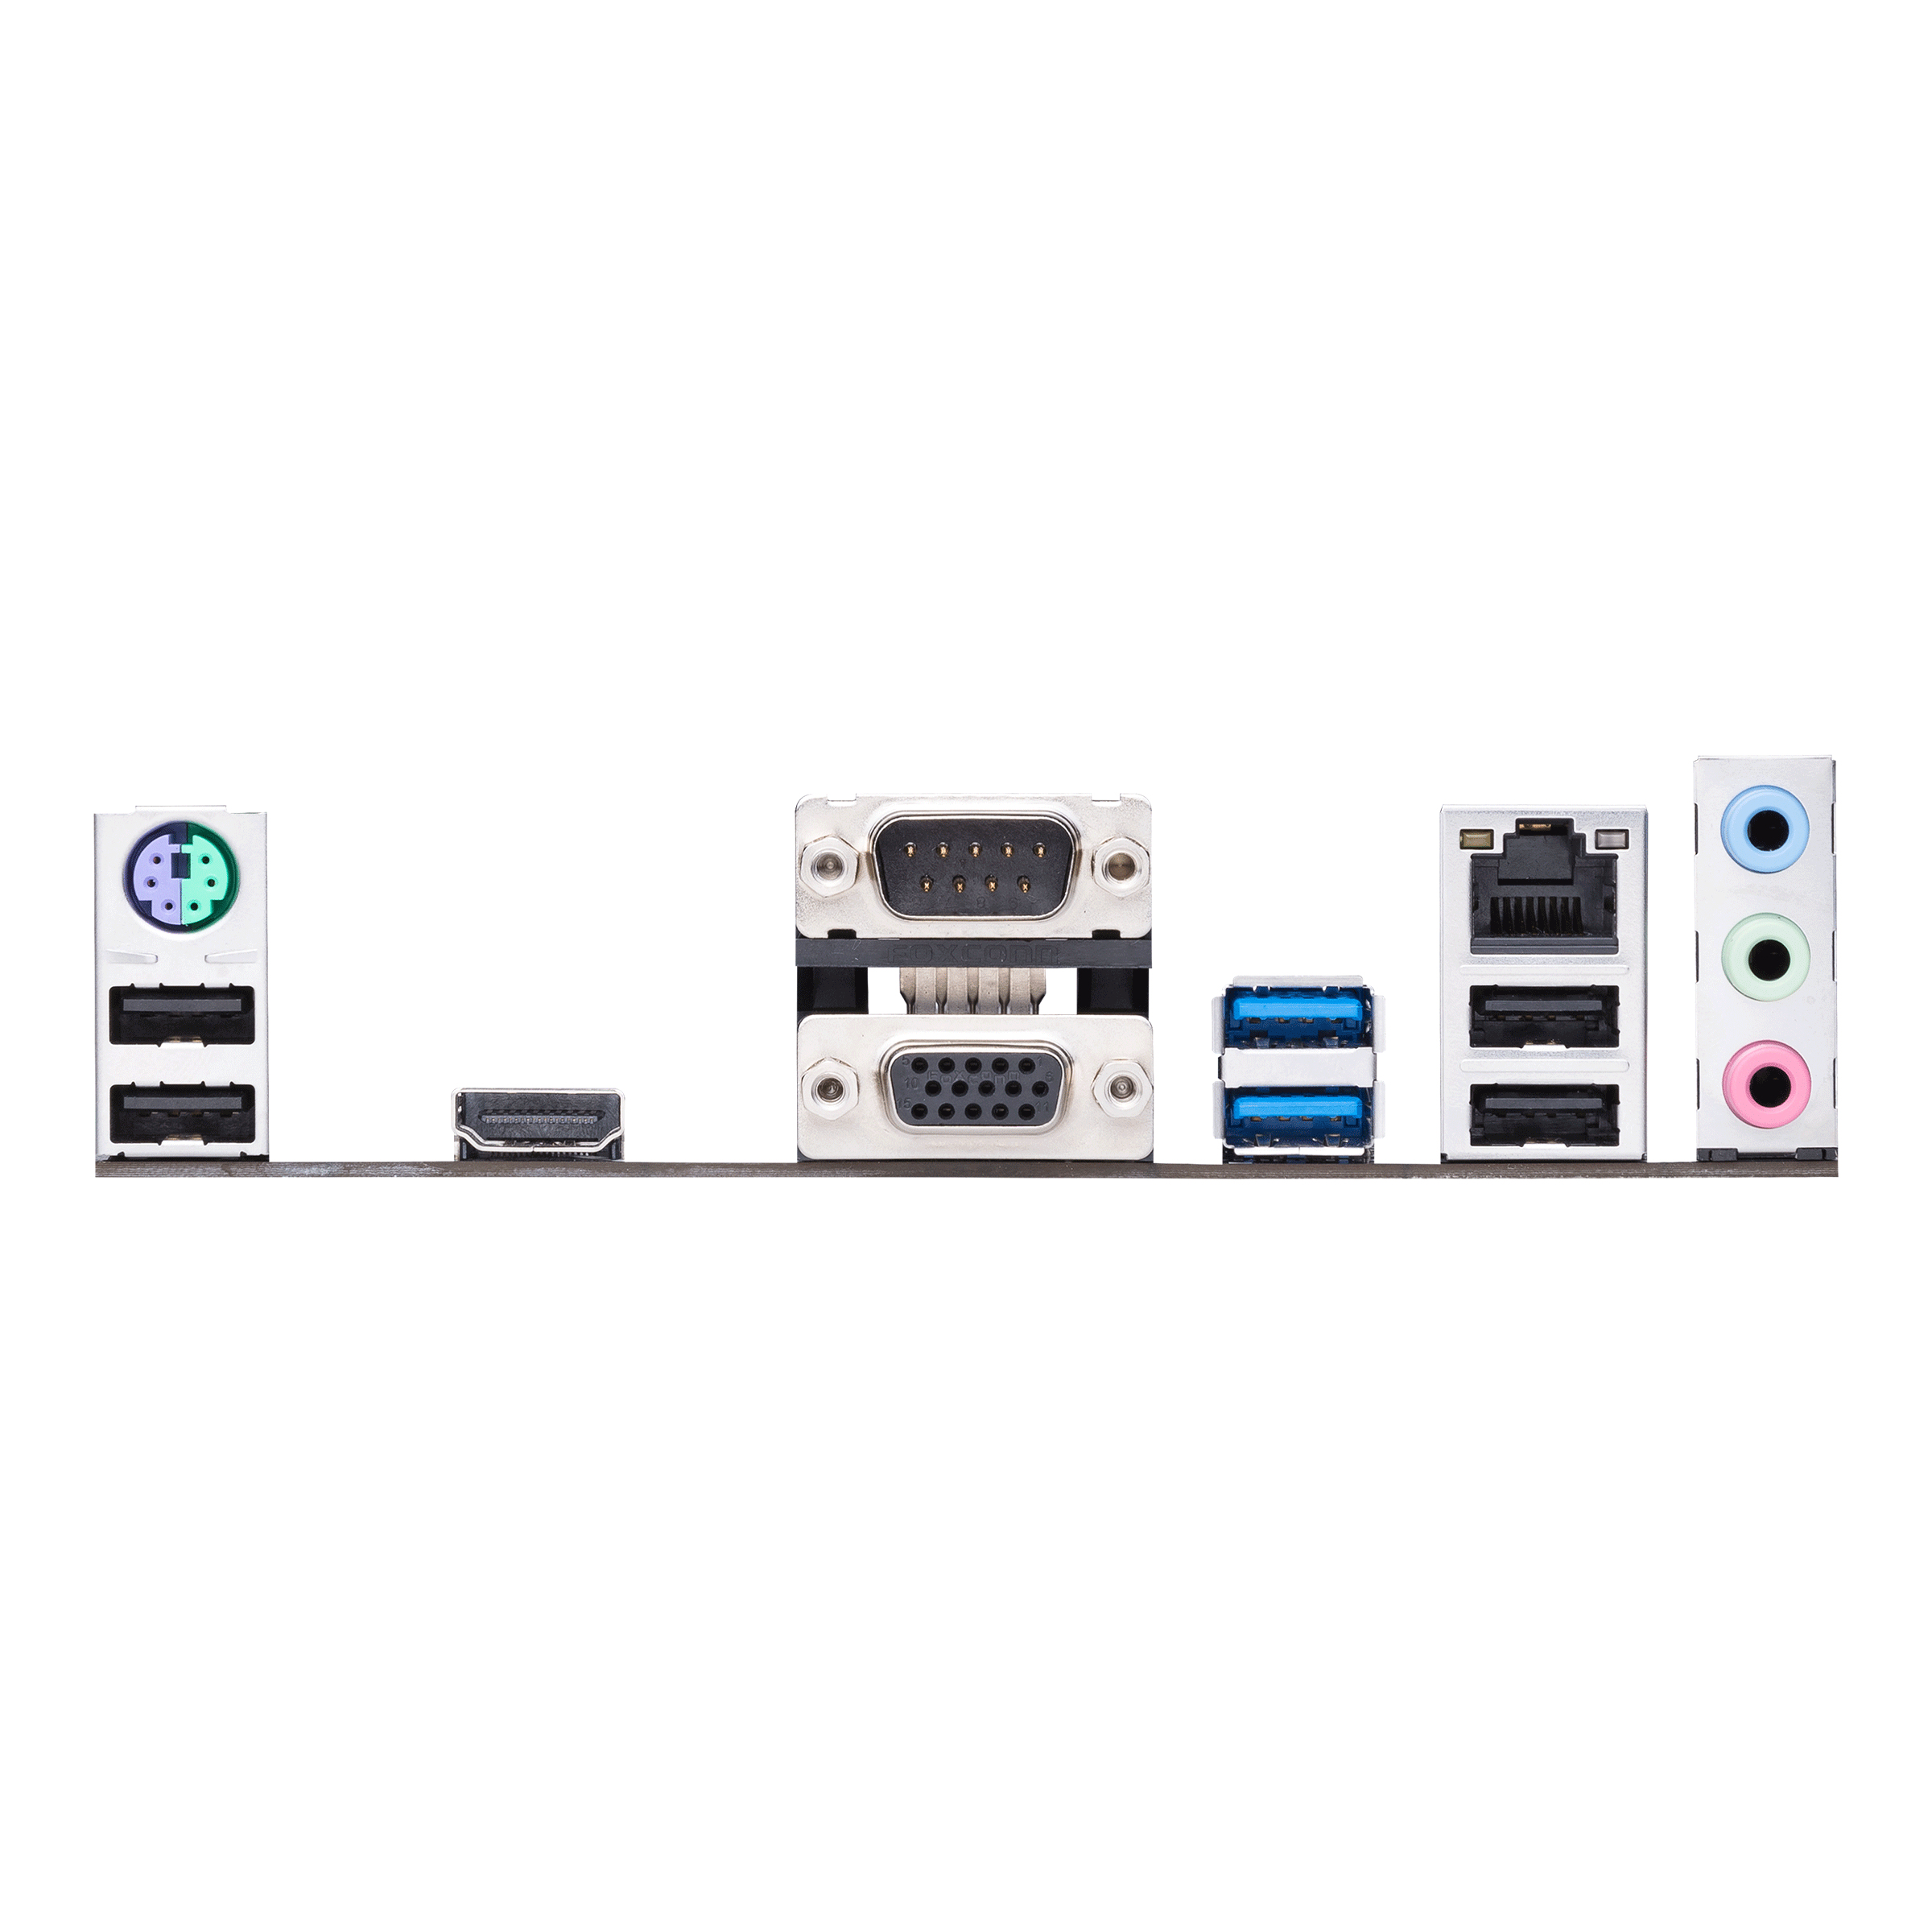 ASUS PRIME H510M-D - Motherboard - micro ATX - LGA1200-Sockel - H510 - USB 3.2 Gen 1 - Gigabit LAN - Onboard-Grafik (CPU erforderlich)